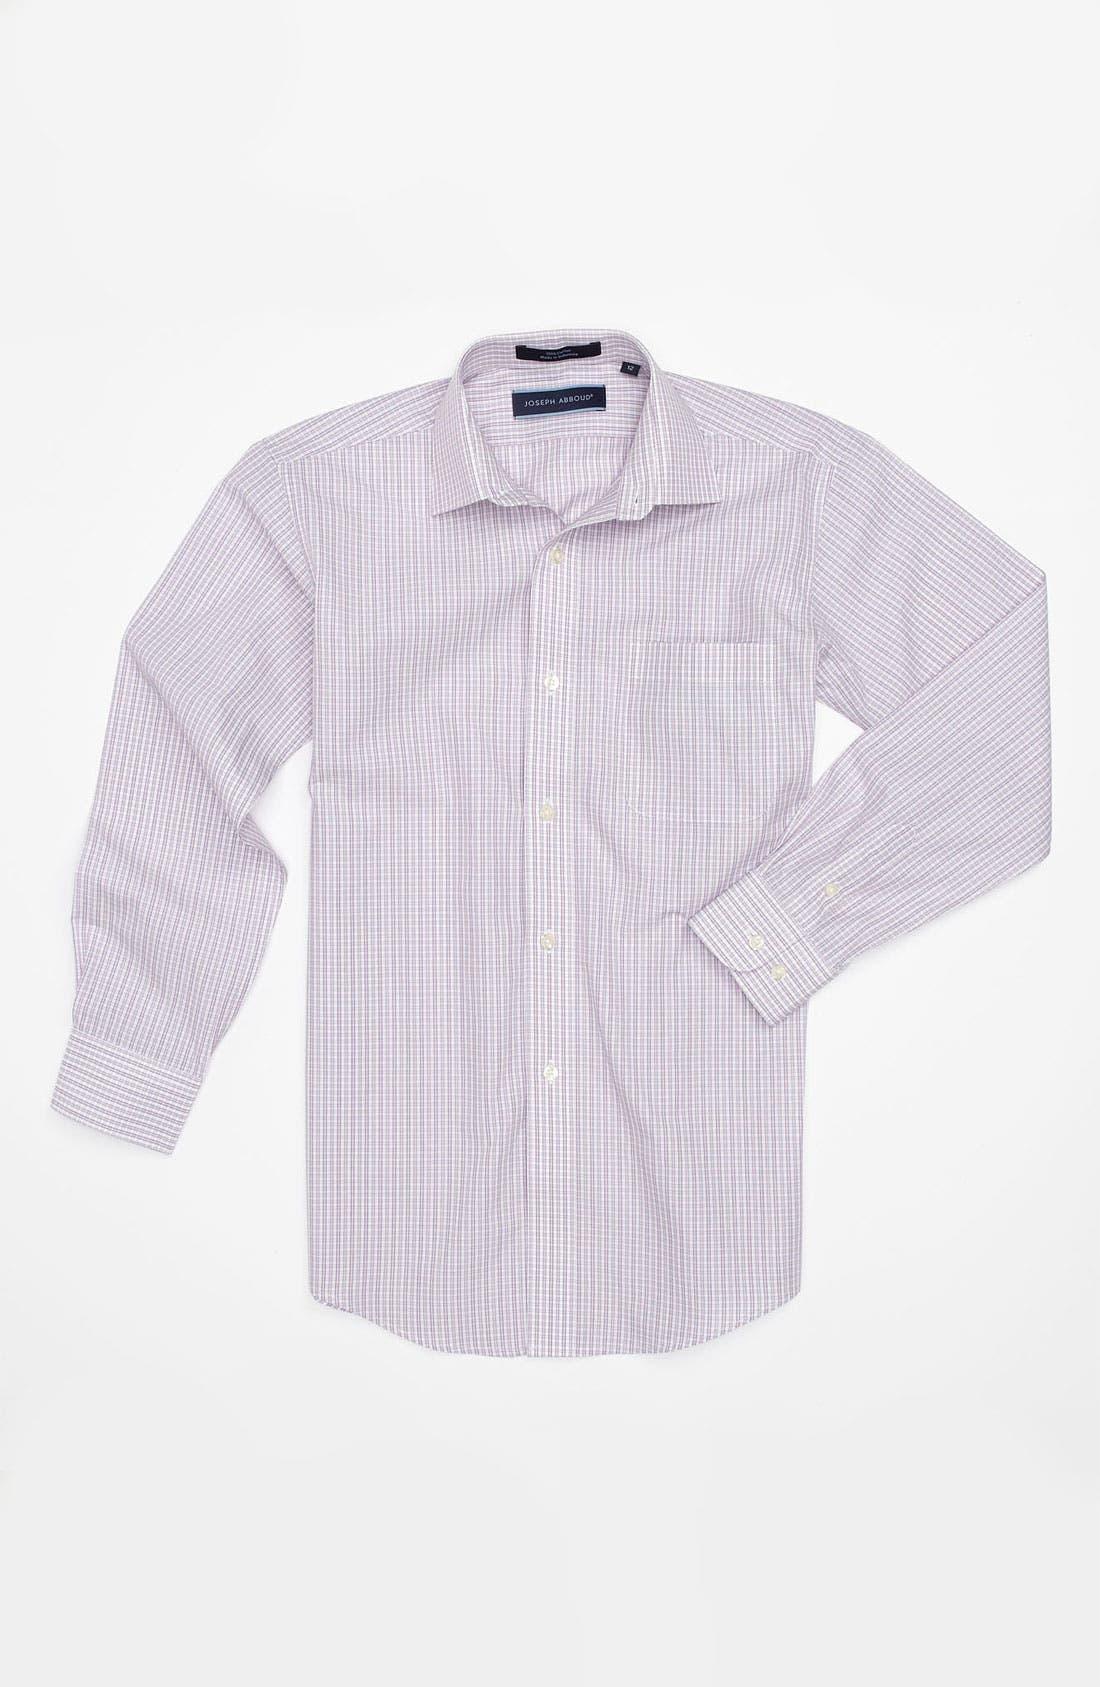 Alternate Image 1 Selected - Joseph Abboud Dress Shirt (Big Boys)